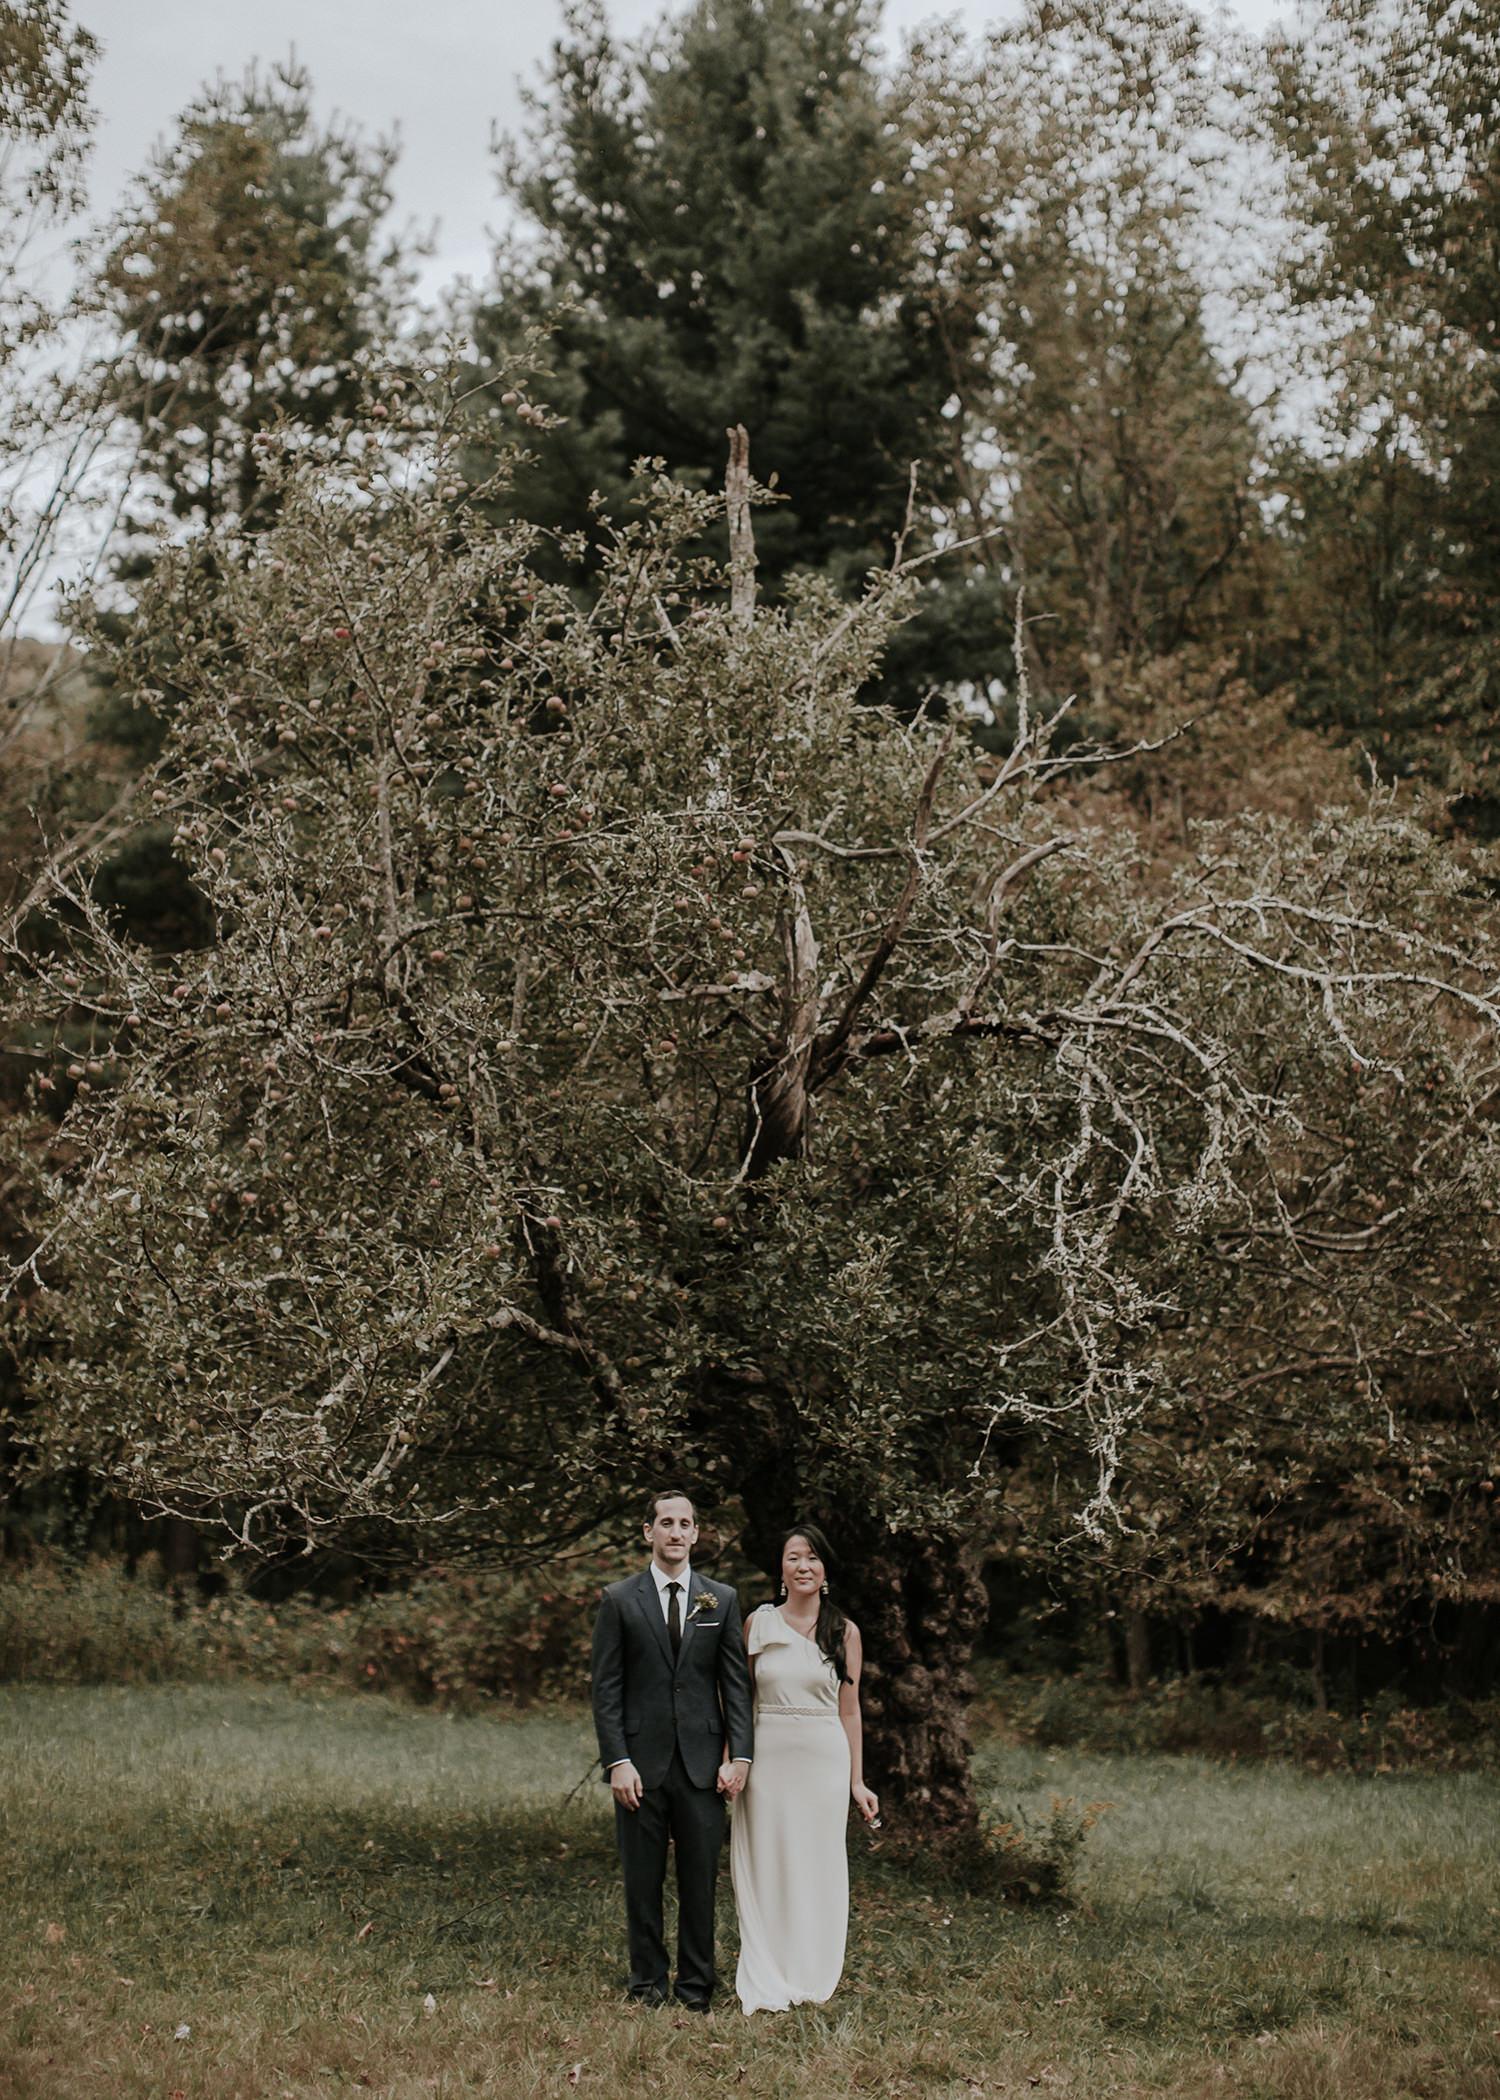 SPENCER+MELISSA-WEDDING628-3.jpg